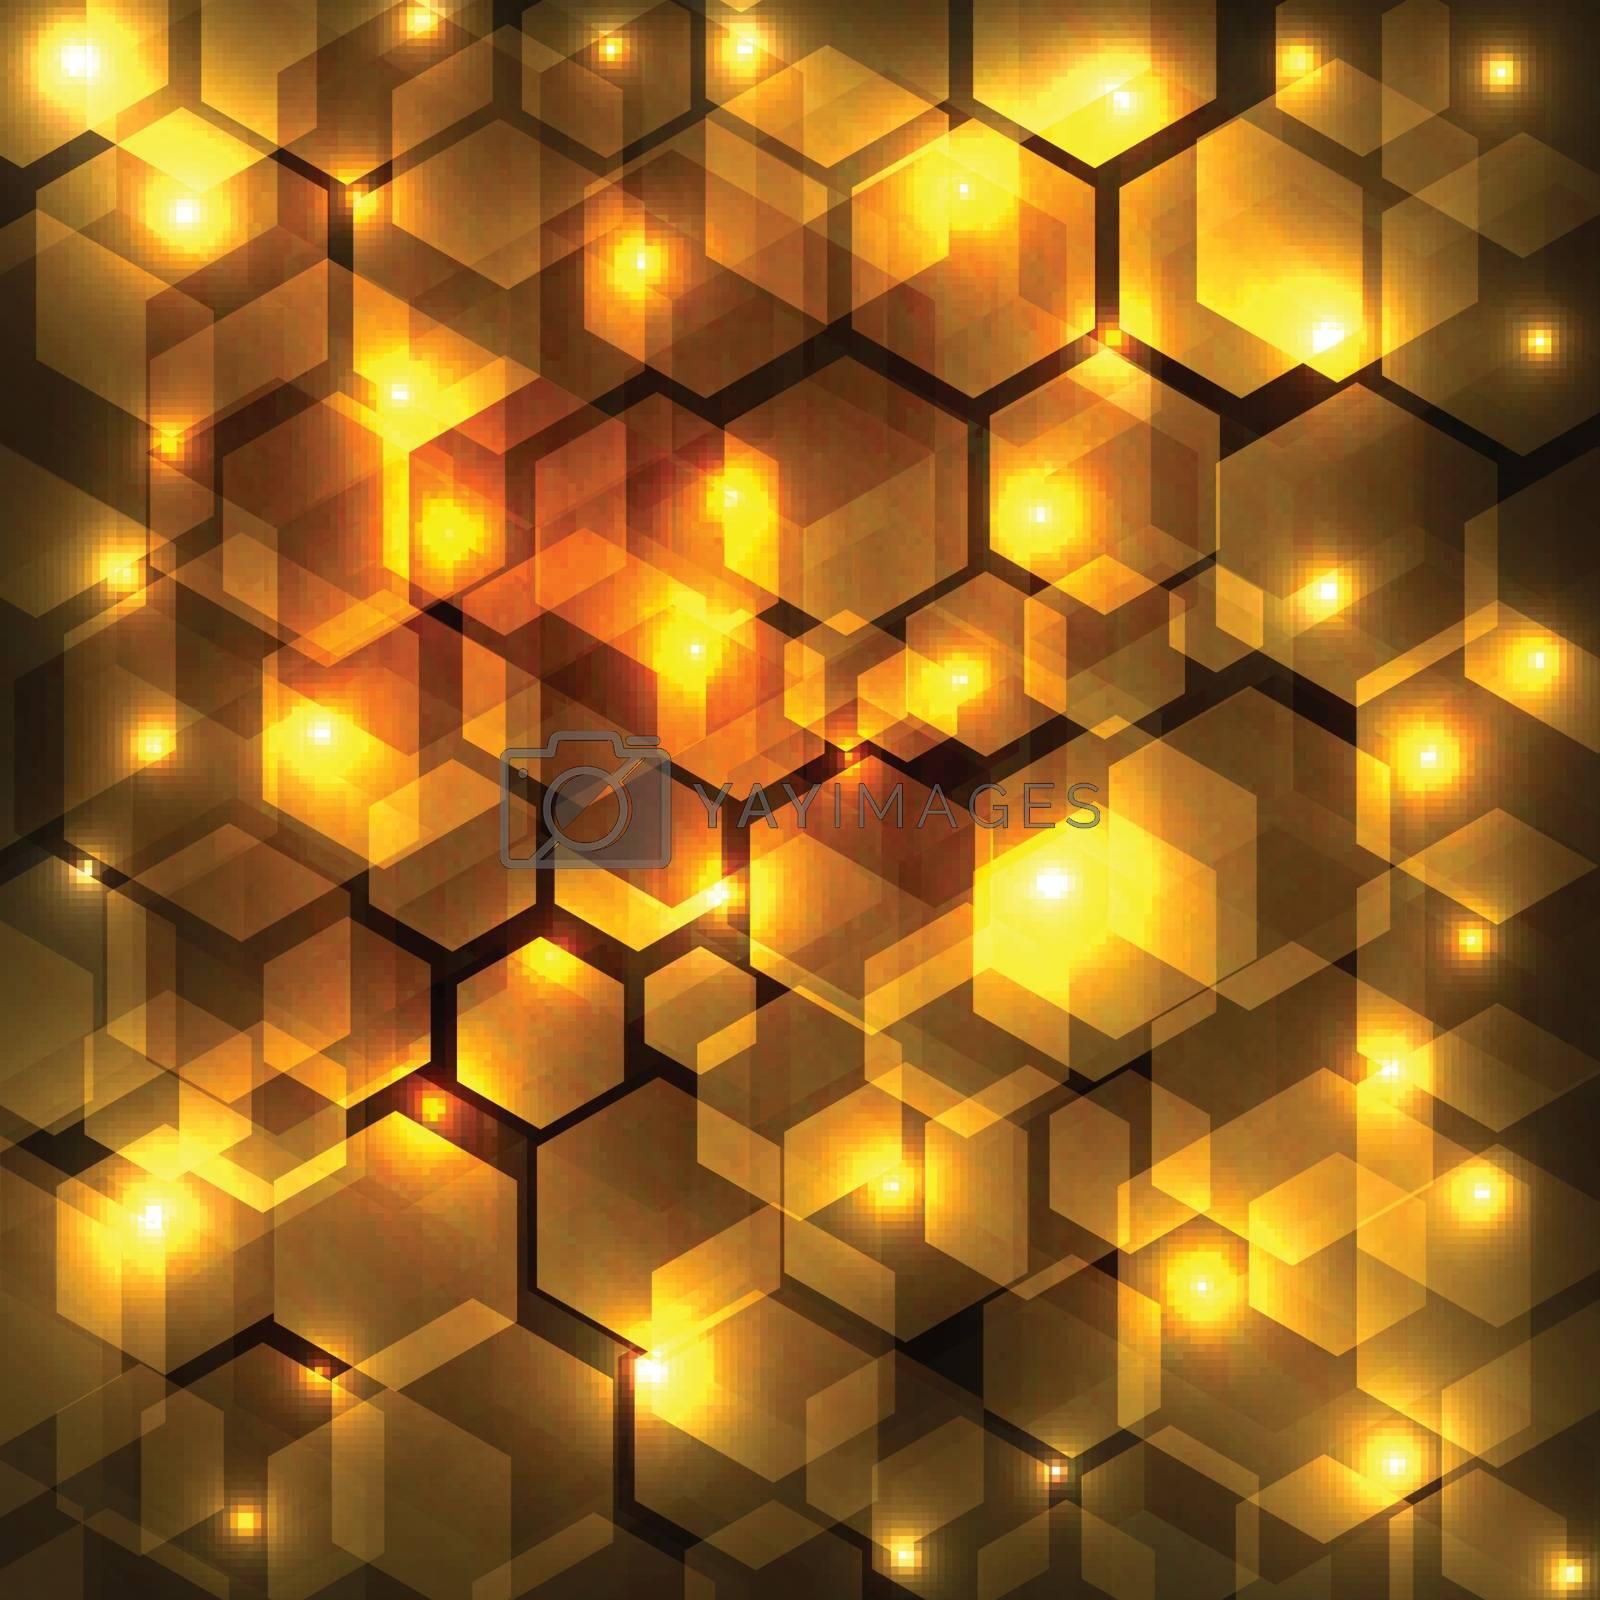 Abstract golden shine hexagon geometric on dark background, Vector illustration